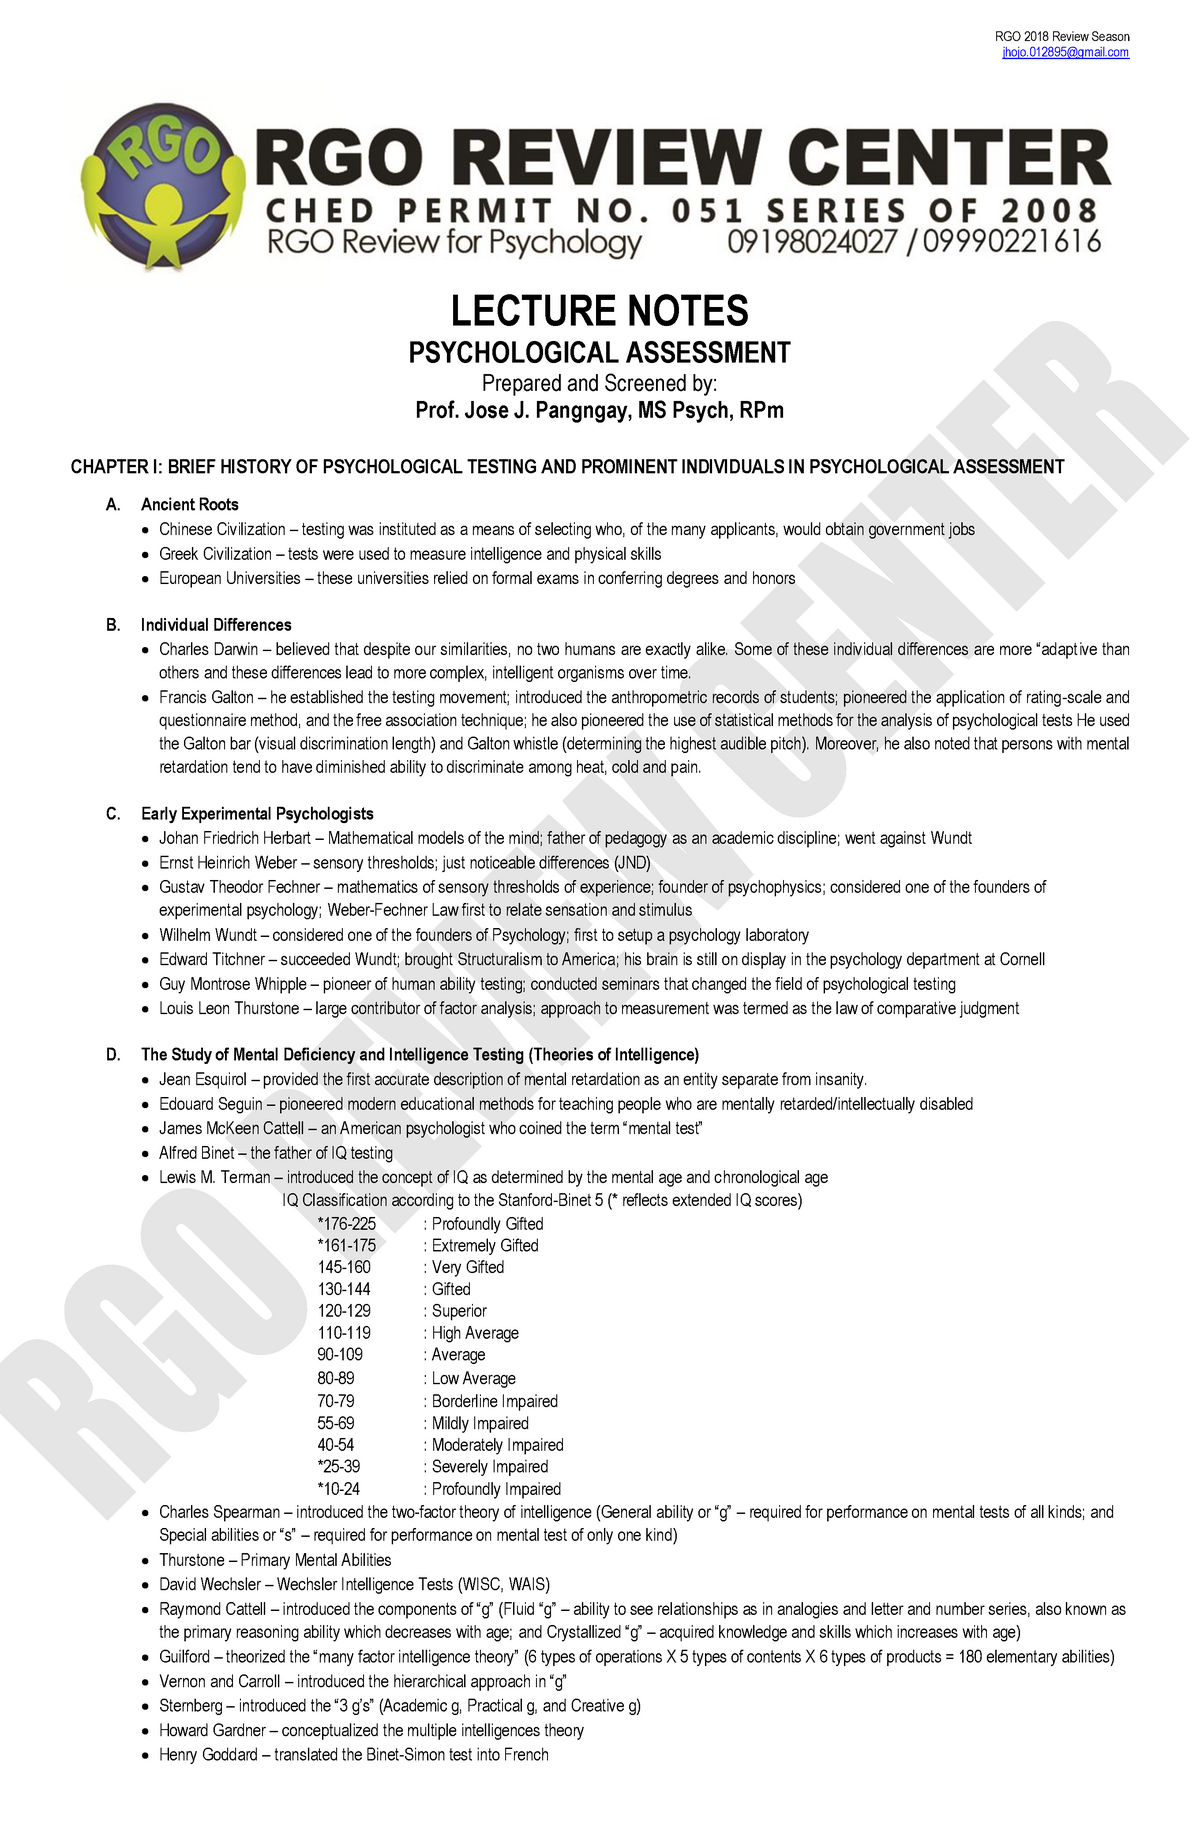 JOJO Psychological-Assessment-Lecture-Notes - 75120 - StuDocu